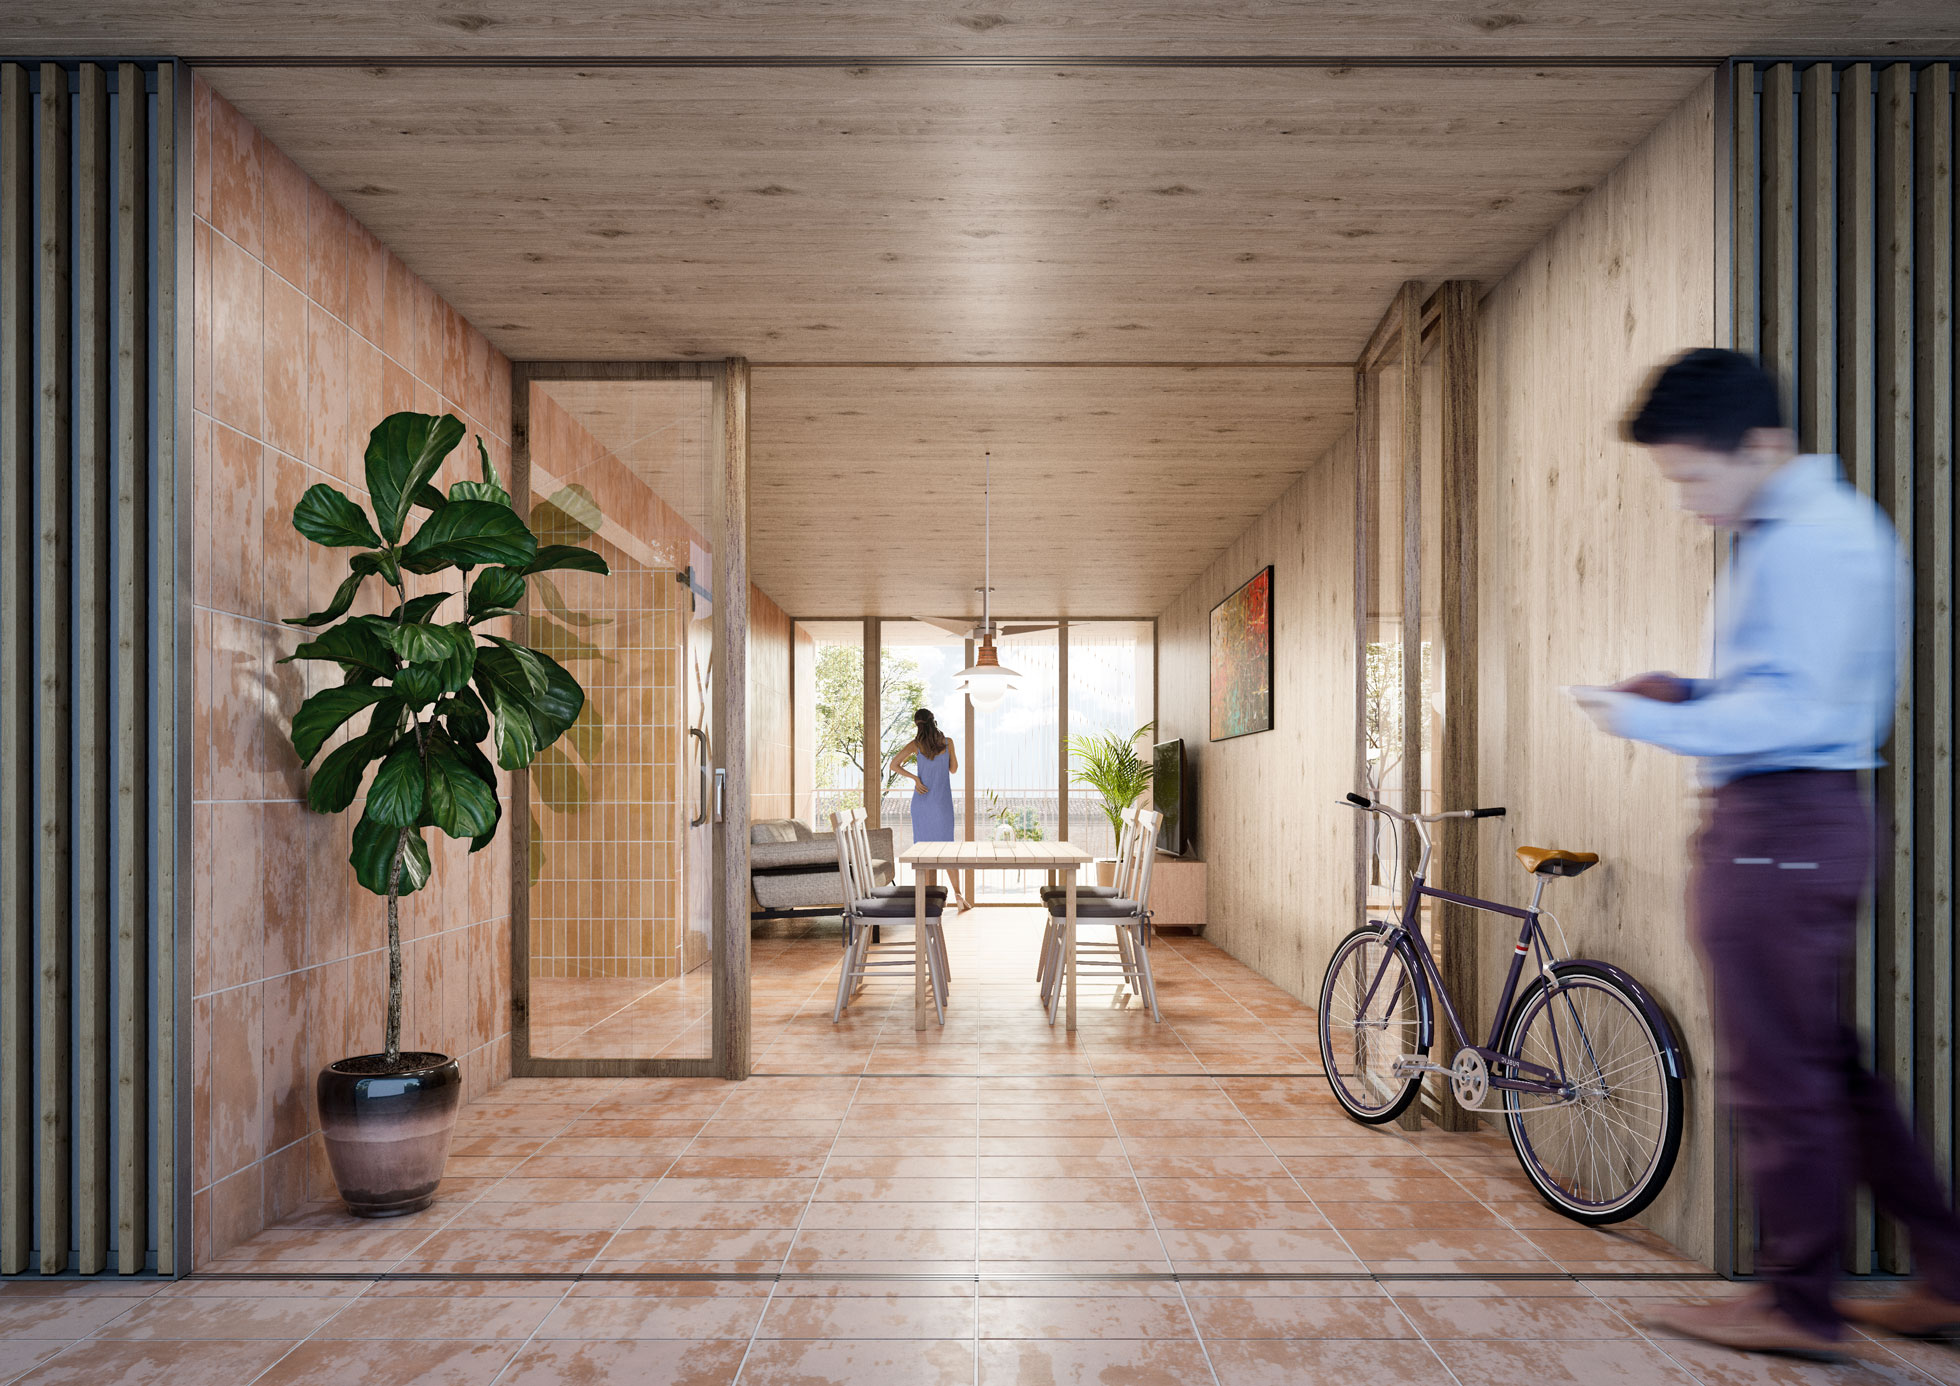 Residencial L'Ordit. Edificio de viviendas. Arquitectos Alicante. Arquitectos en Palma de Mallorca. eneseis Arquitectura